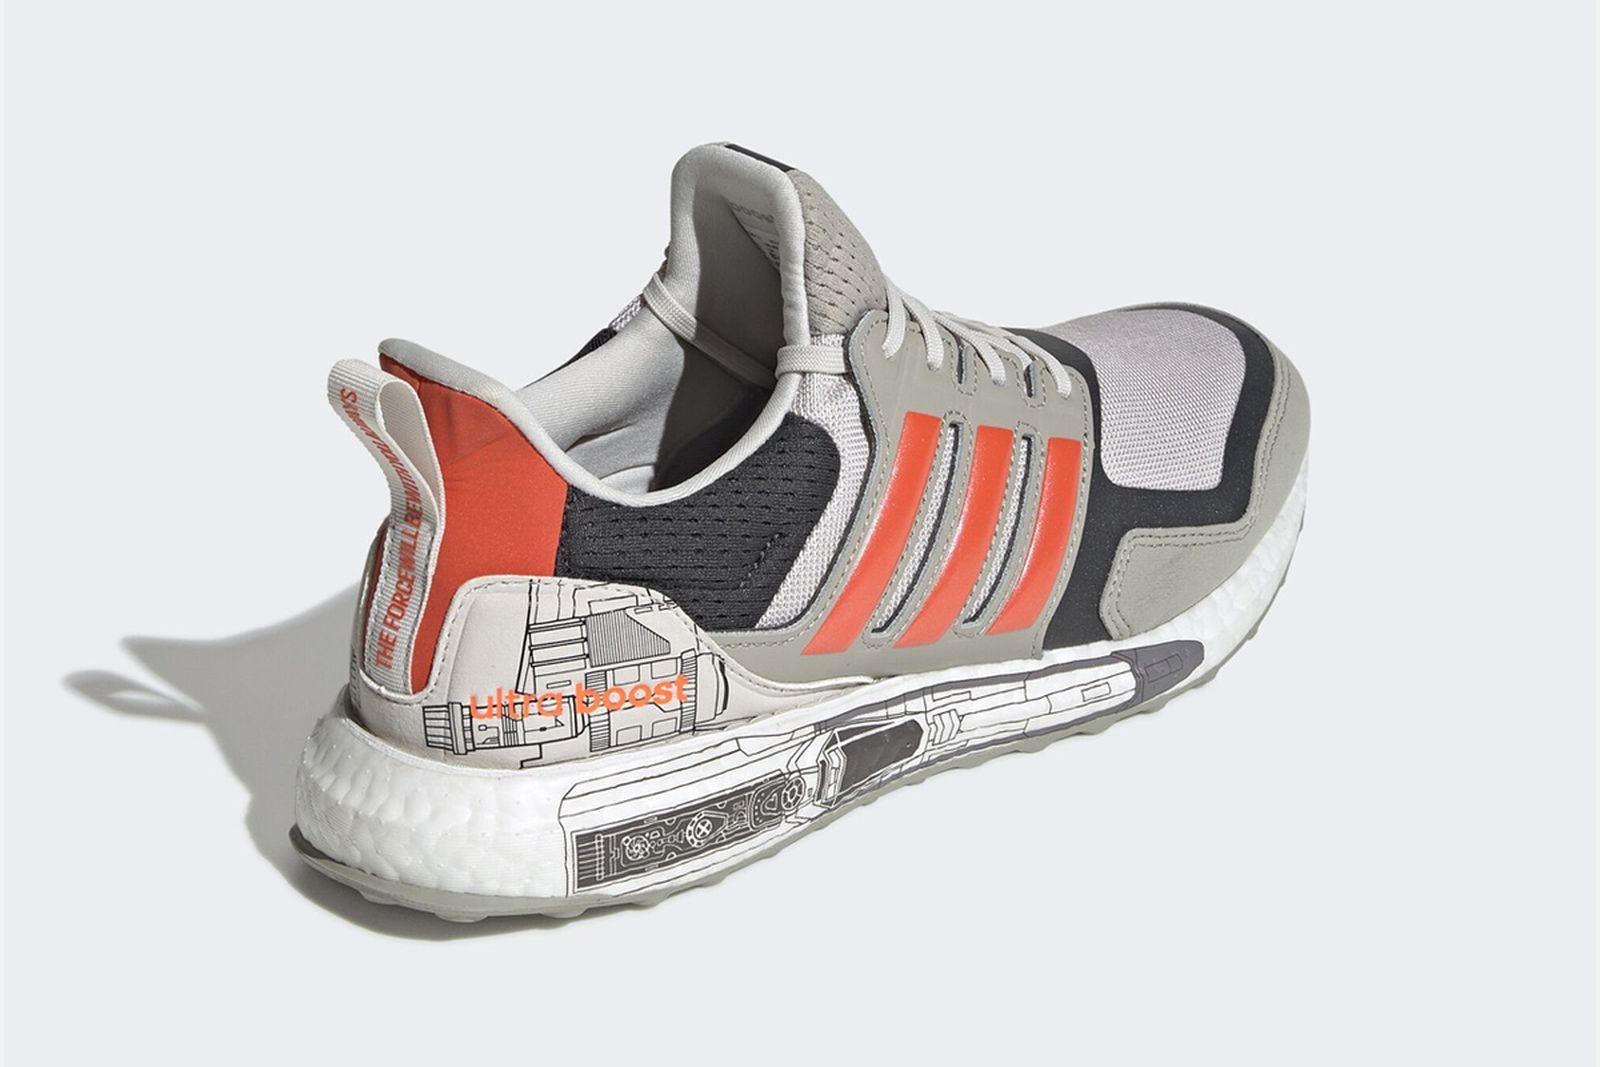 star wars adidas ultraboost x wing release date price Star Wars: The Rise of Skywalker disney